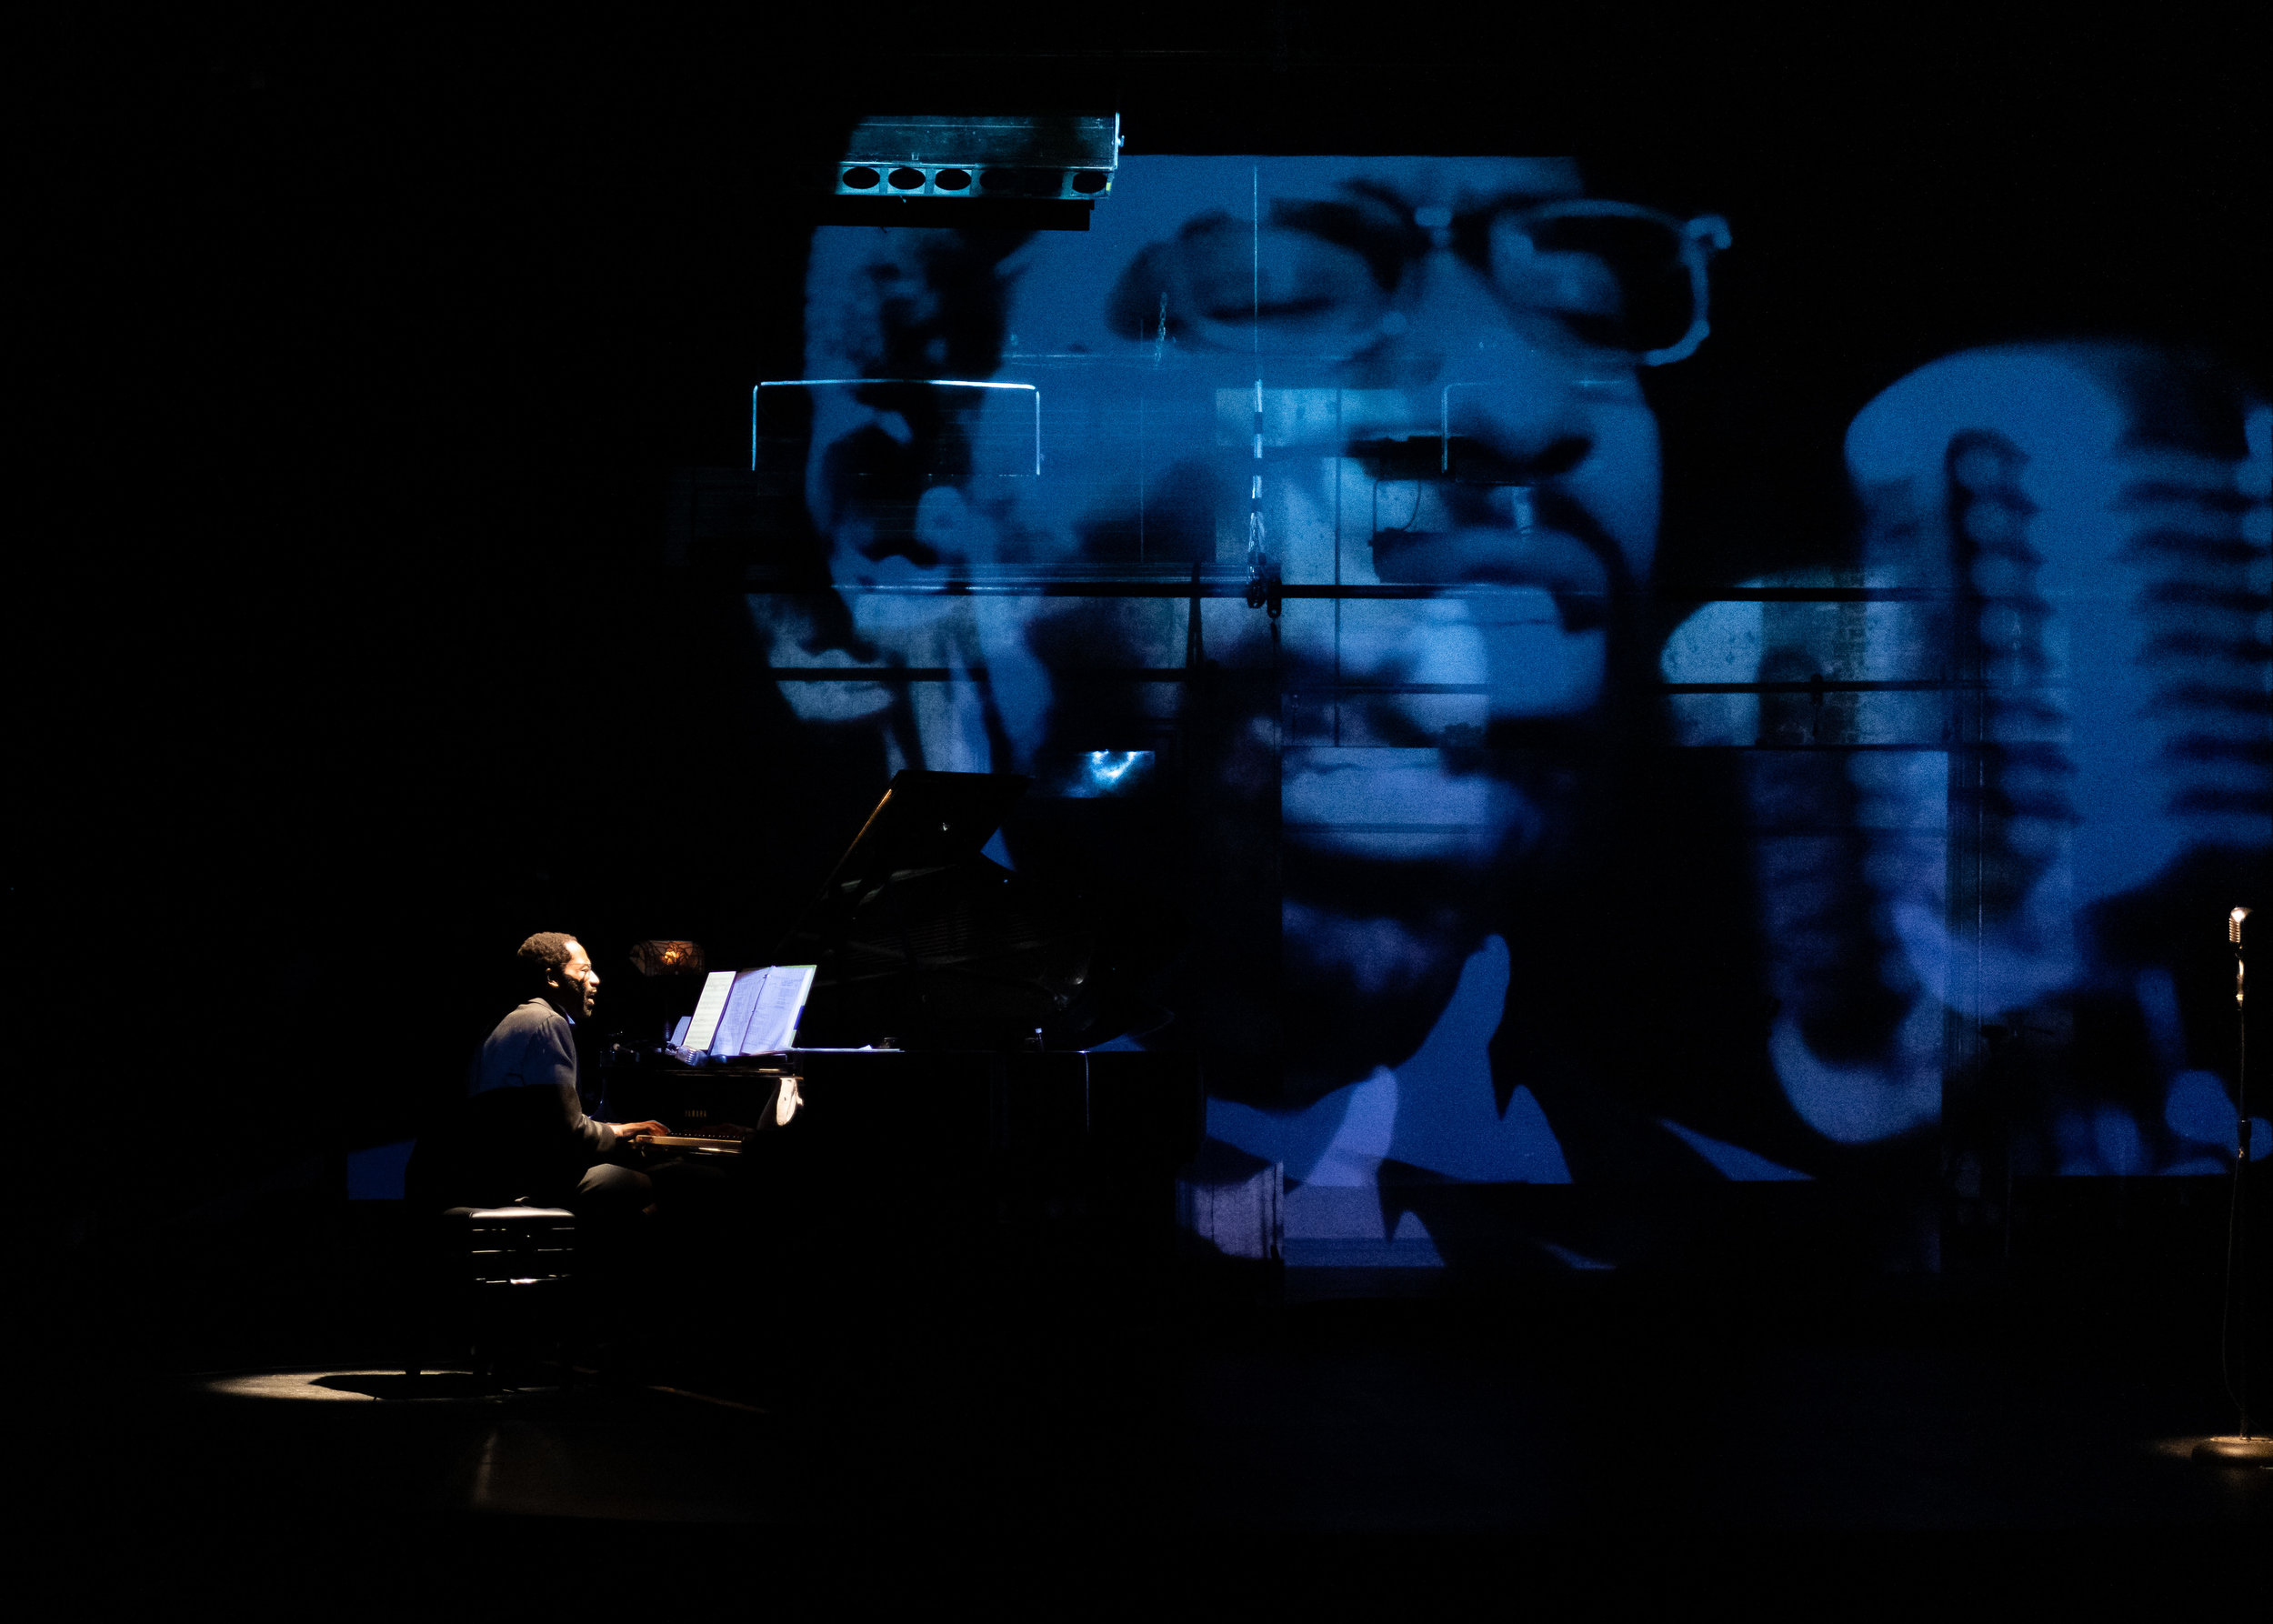 _jazz singer_featuring Nehemiah Luckett_CREDIT IAN DOUGLAS.jpg.jpg